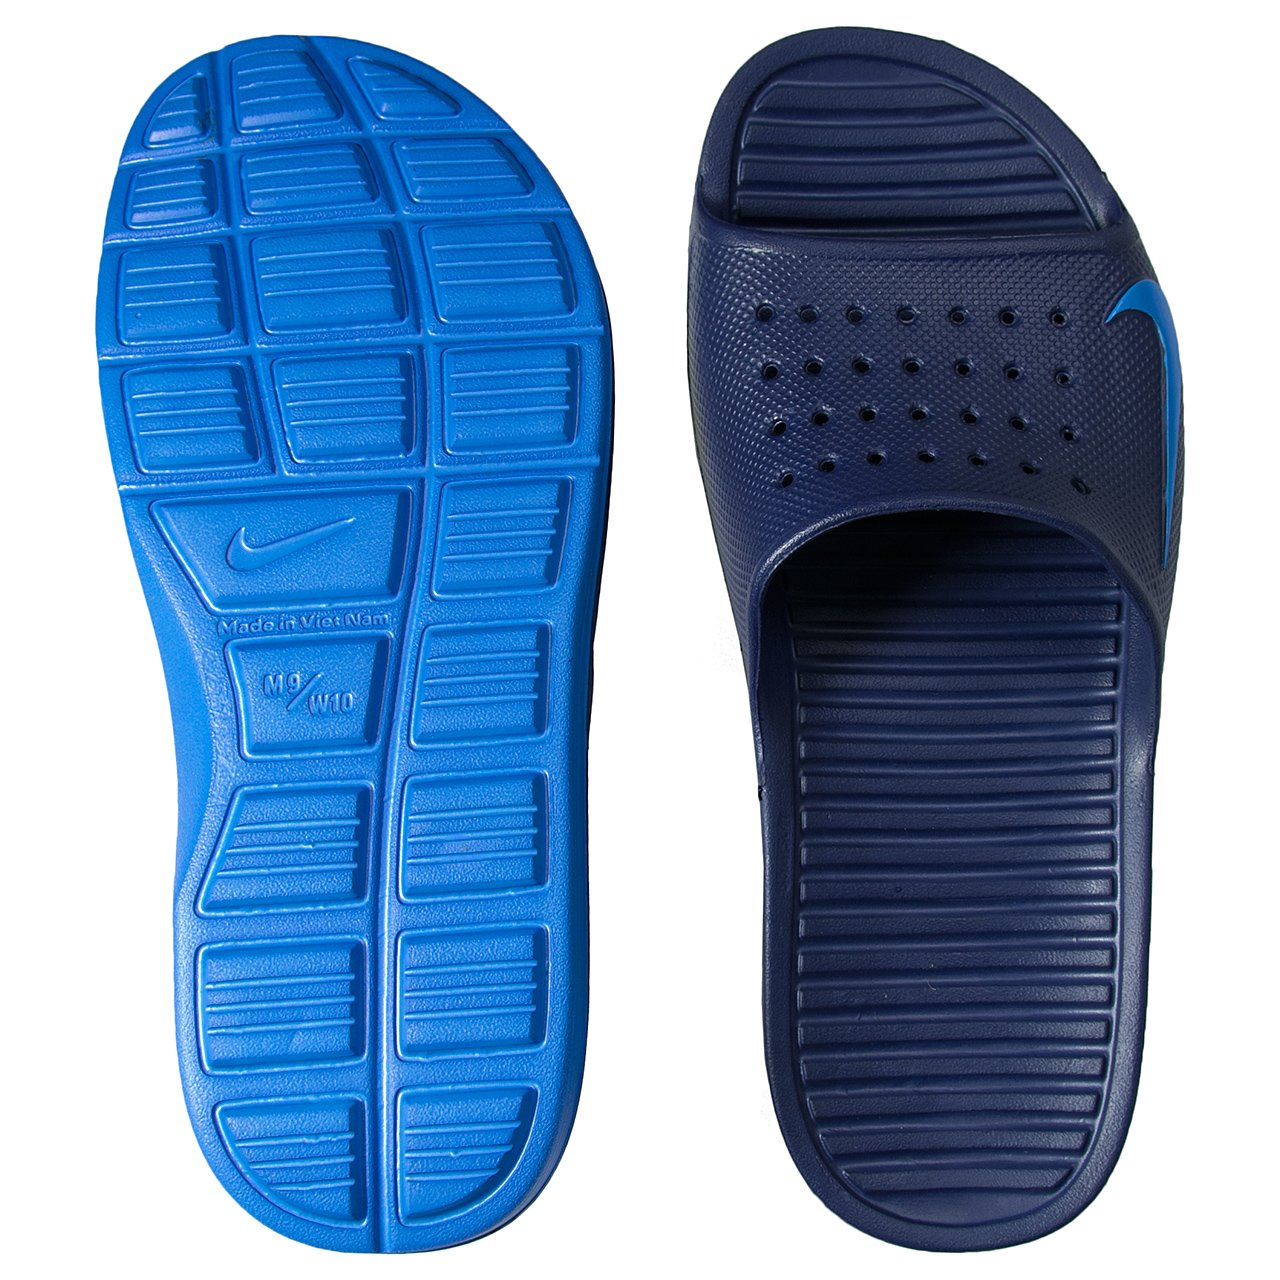 Nike Solar Soft Slide Ciabatte da Uomo, DunkelblauBlau